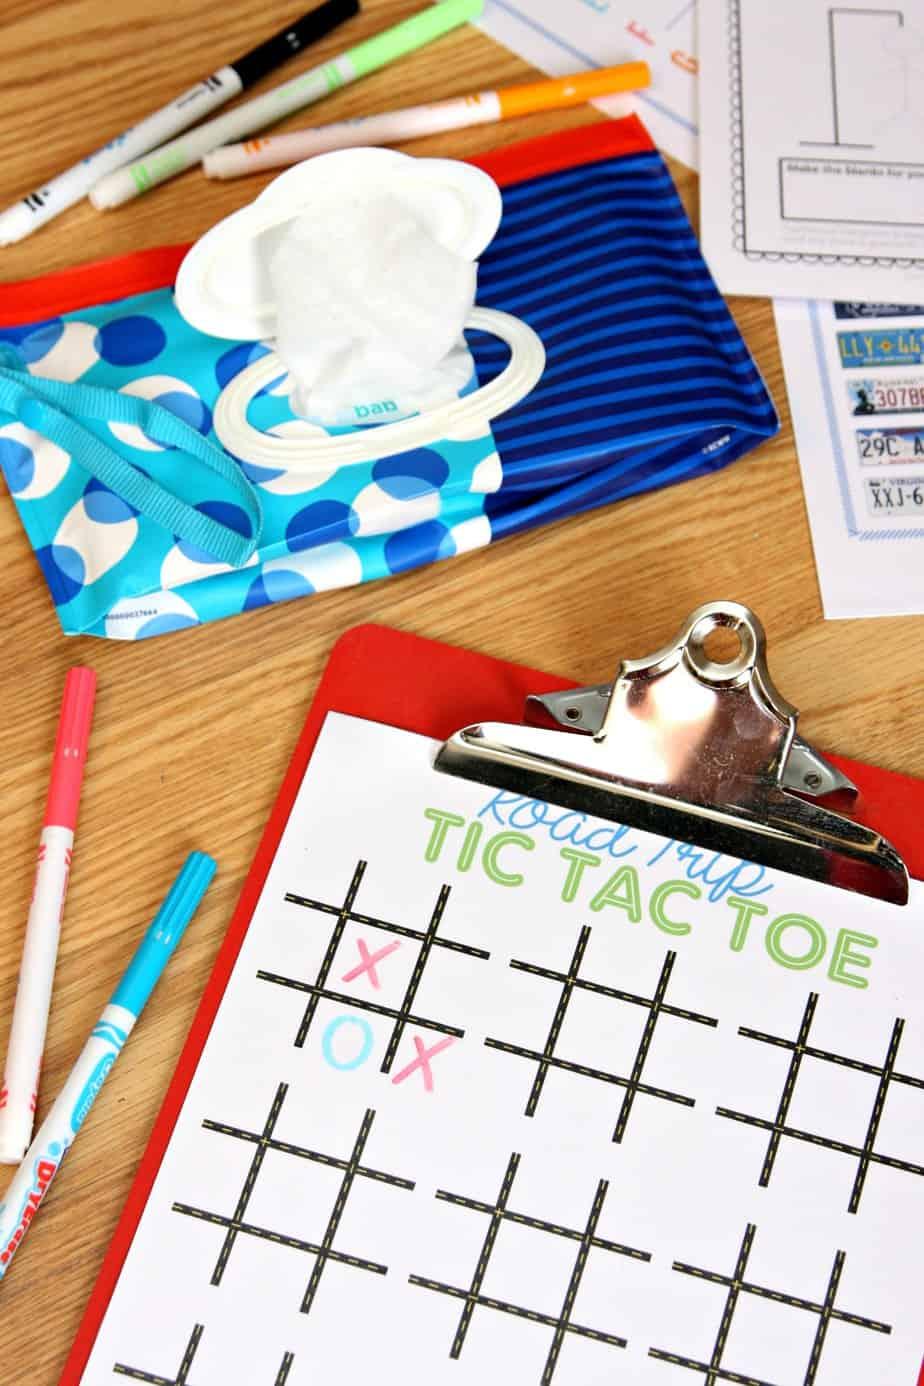 Road Trip Kit for Kids - Dry Erase Boards